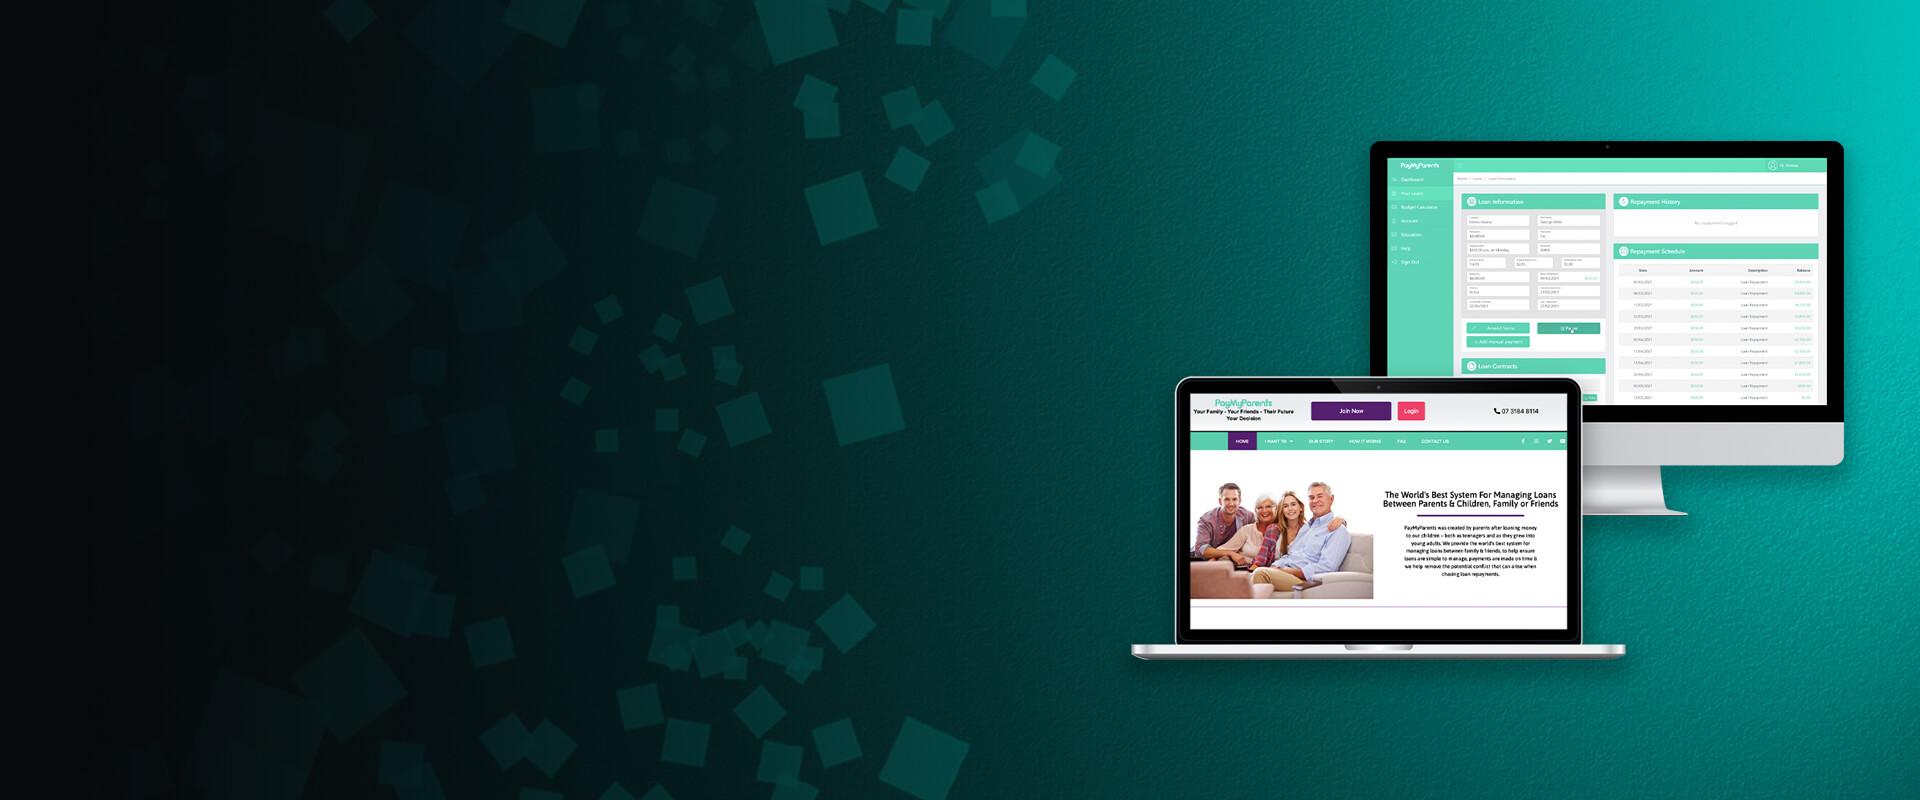 PayMyParents Loan Management Platform - Visartech Portfolio